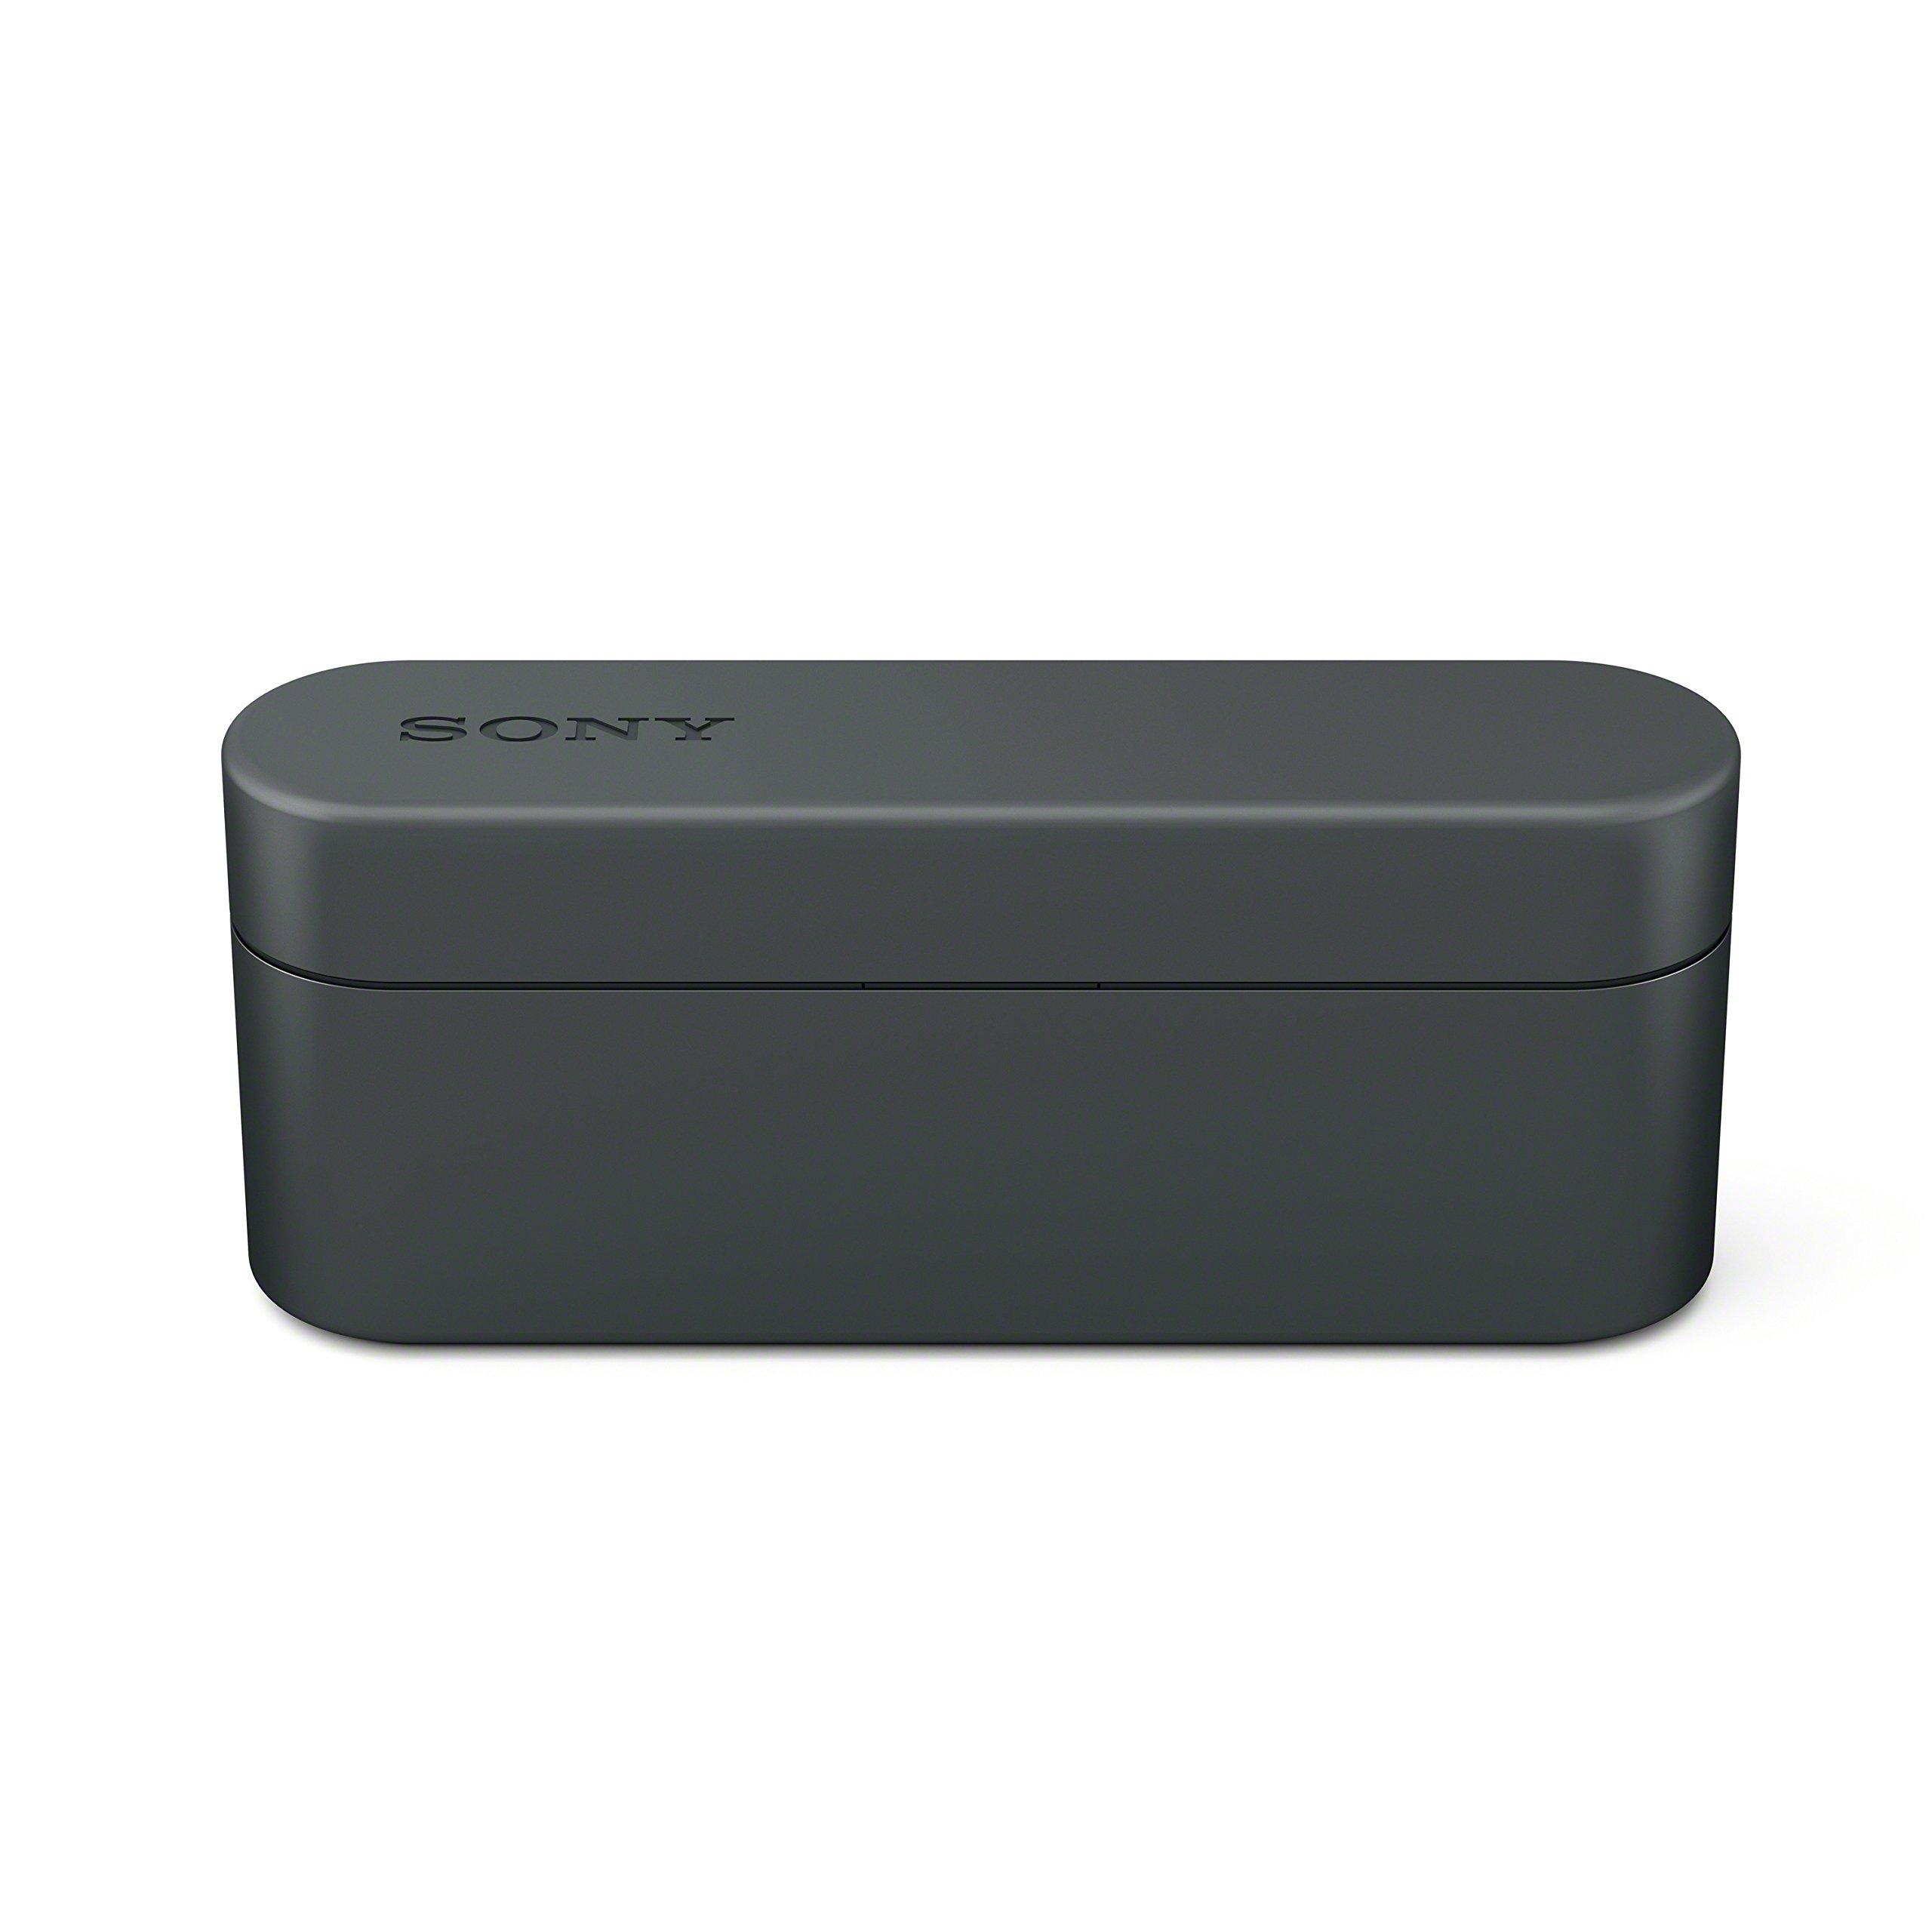 Sony Premium Noise Cancelling True Wireless Headphones - Black (WF1000X/B) by Sony (Image #9)